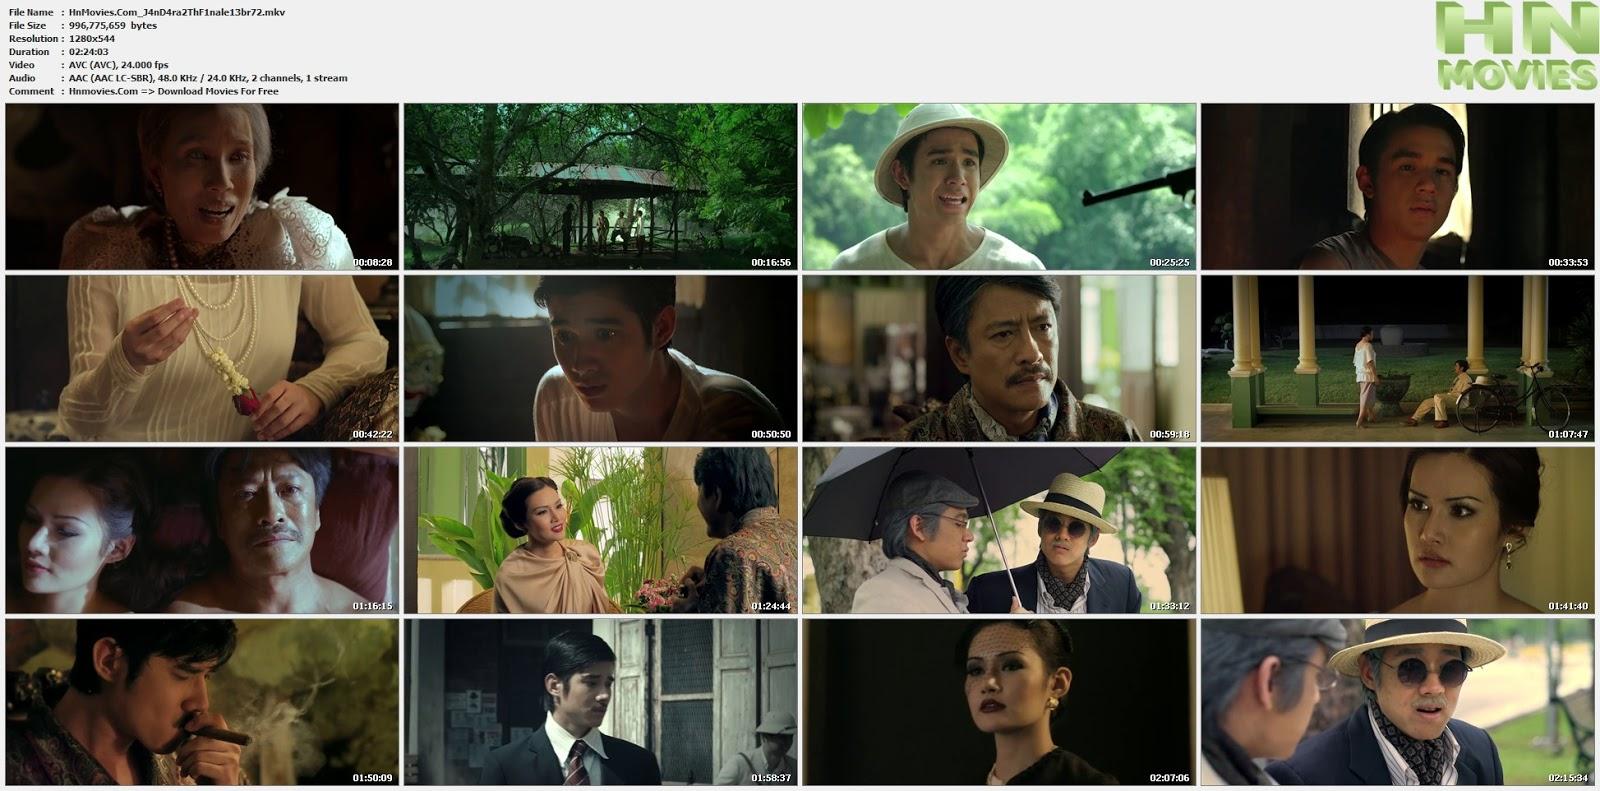 movie screenshot of Jan Dara 2: The Finale fdmovie.com